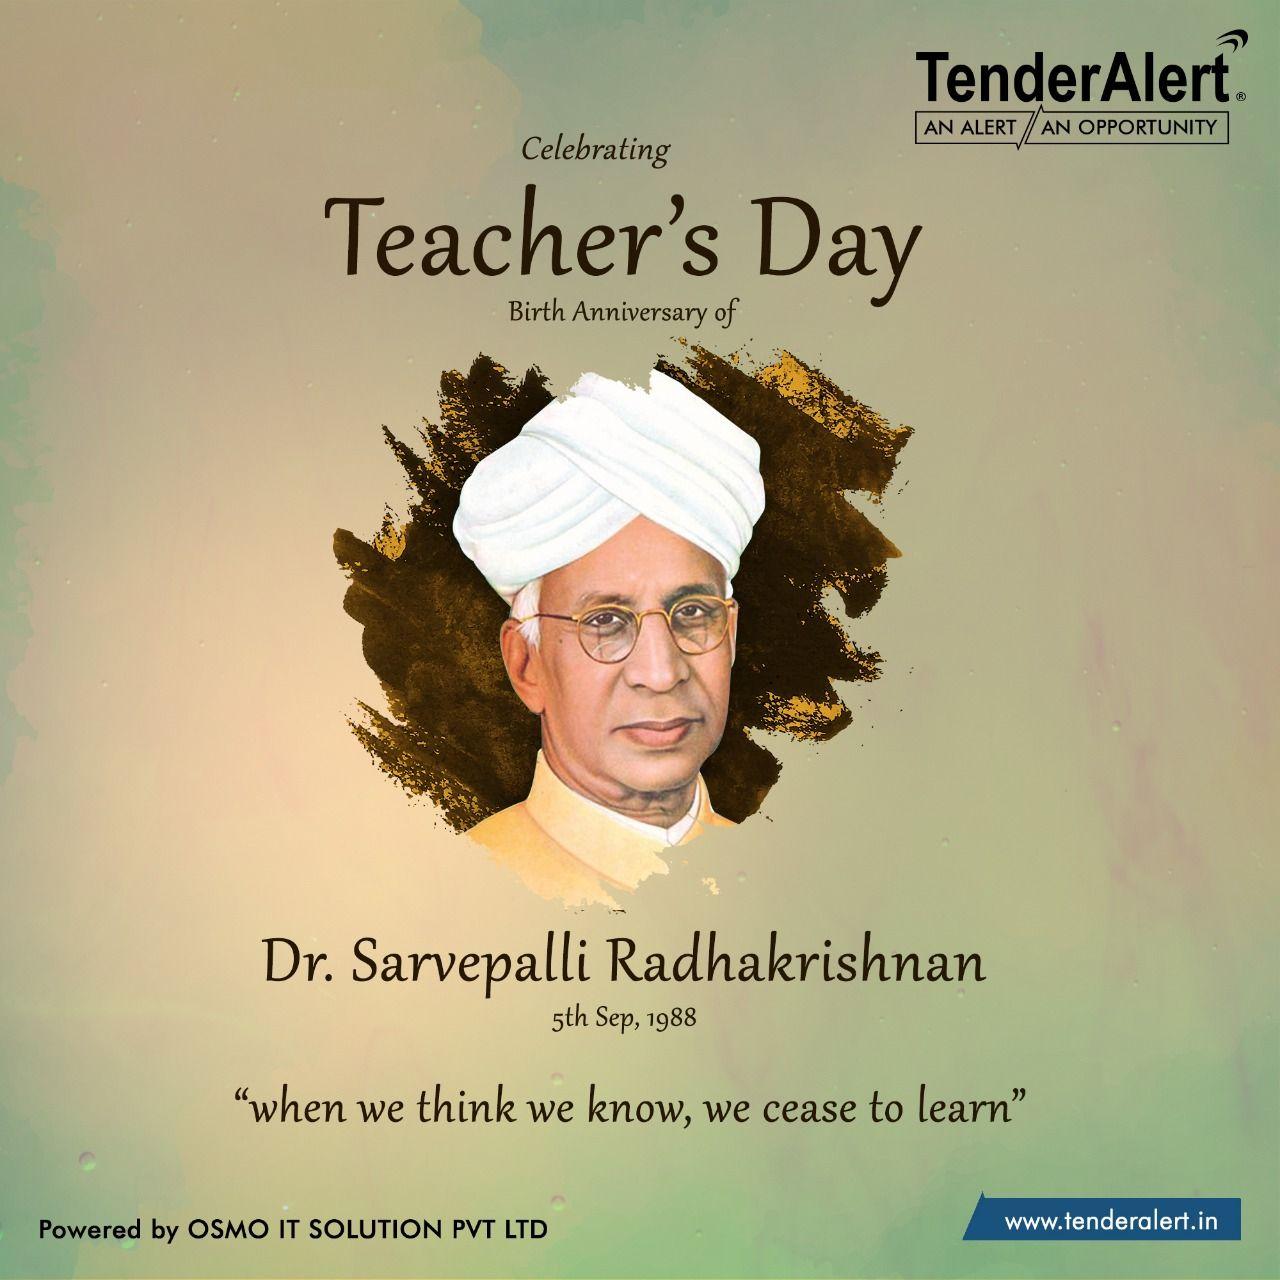 Happy Teacher S Day 2018 When We Think We Know We Chase To Learn Dr Sarvepalli Radhakrishnan Teachers Happy Teachers Day Teachers Day Teachers Be Like